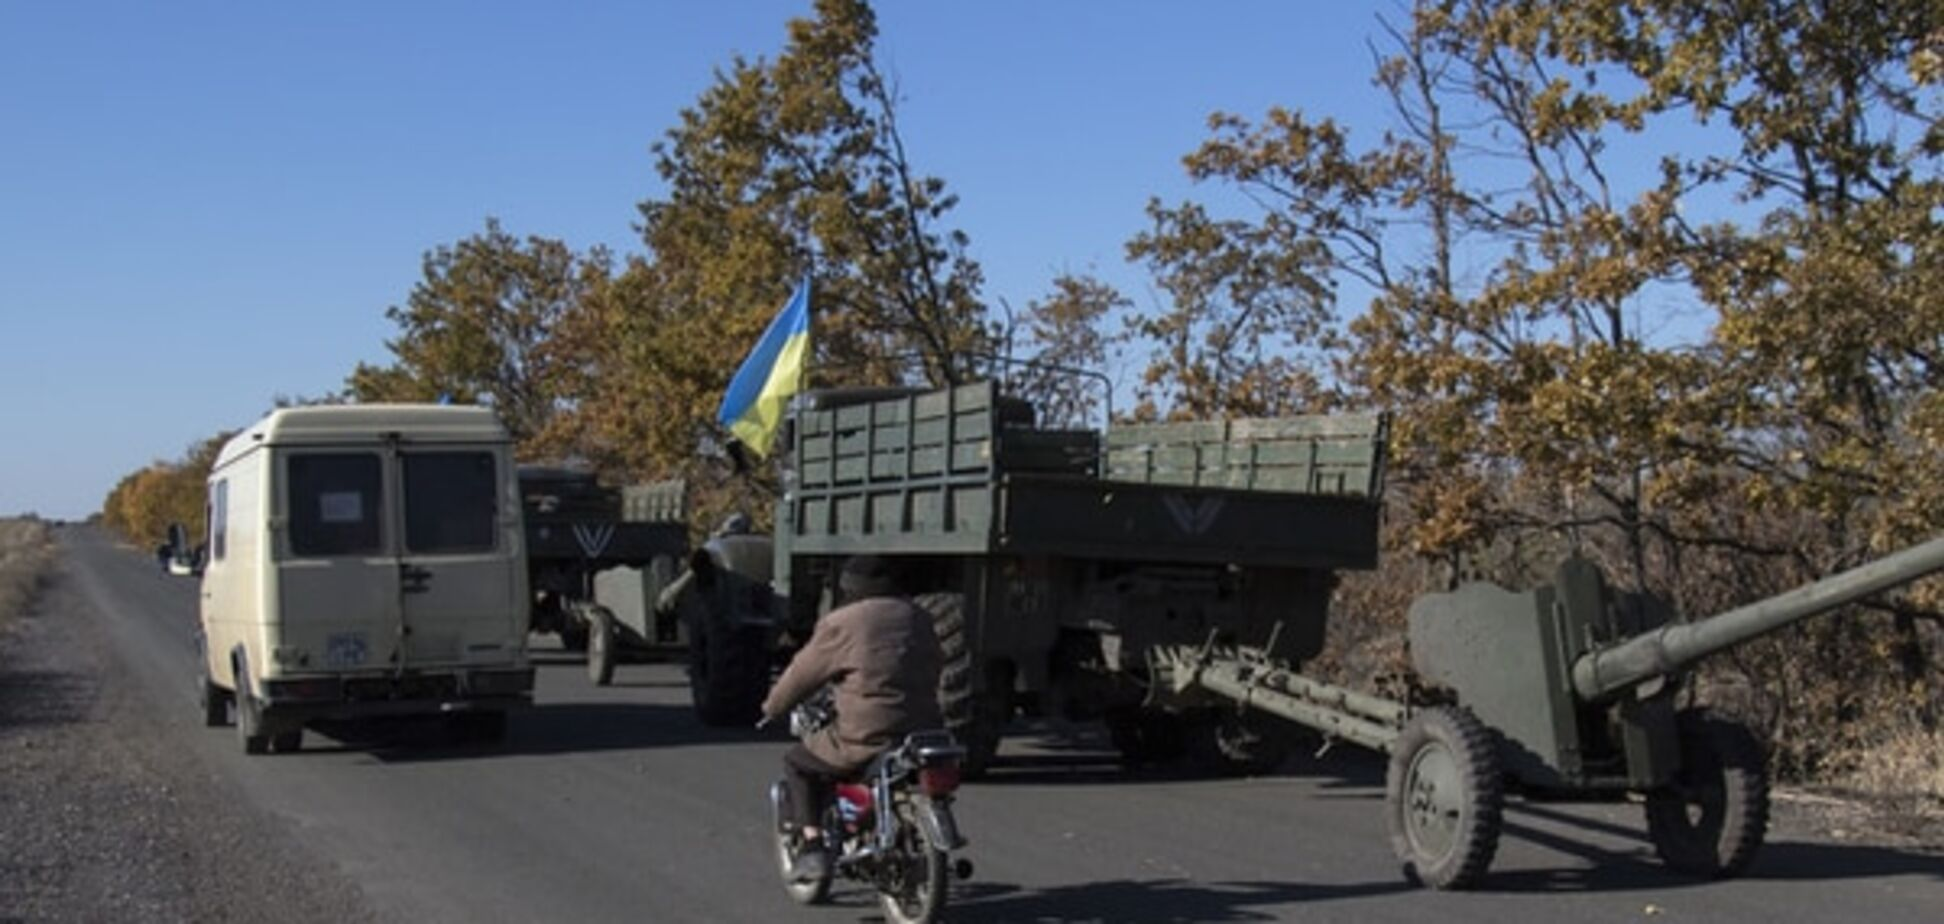 Тука оголосив про закриття 'дипломатичного проекту Мінськ'